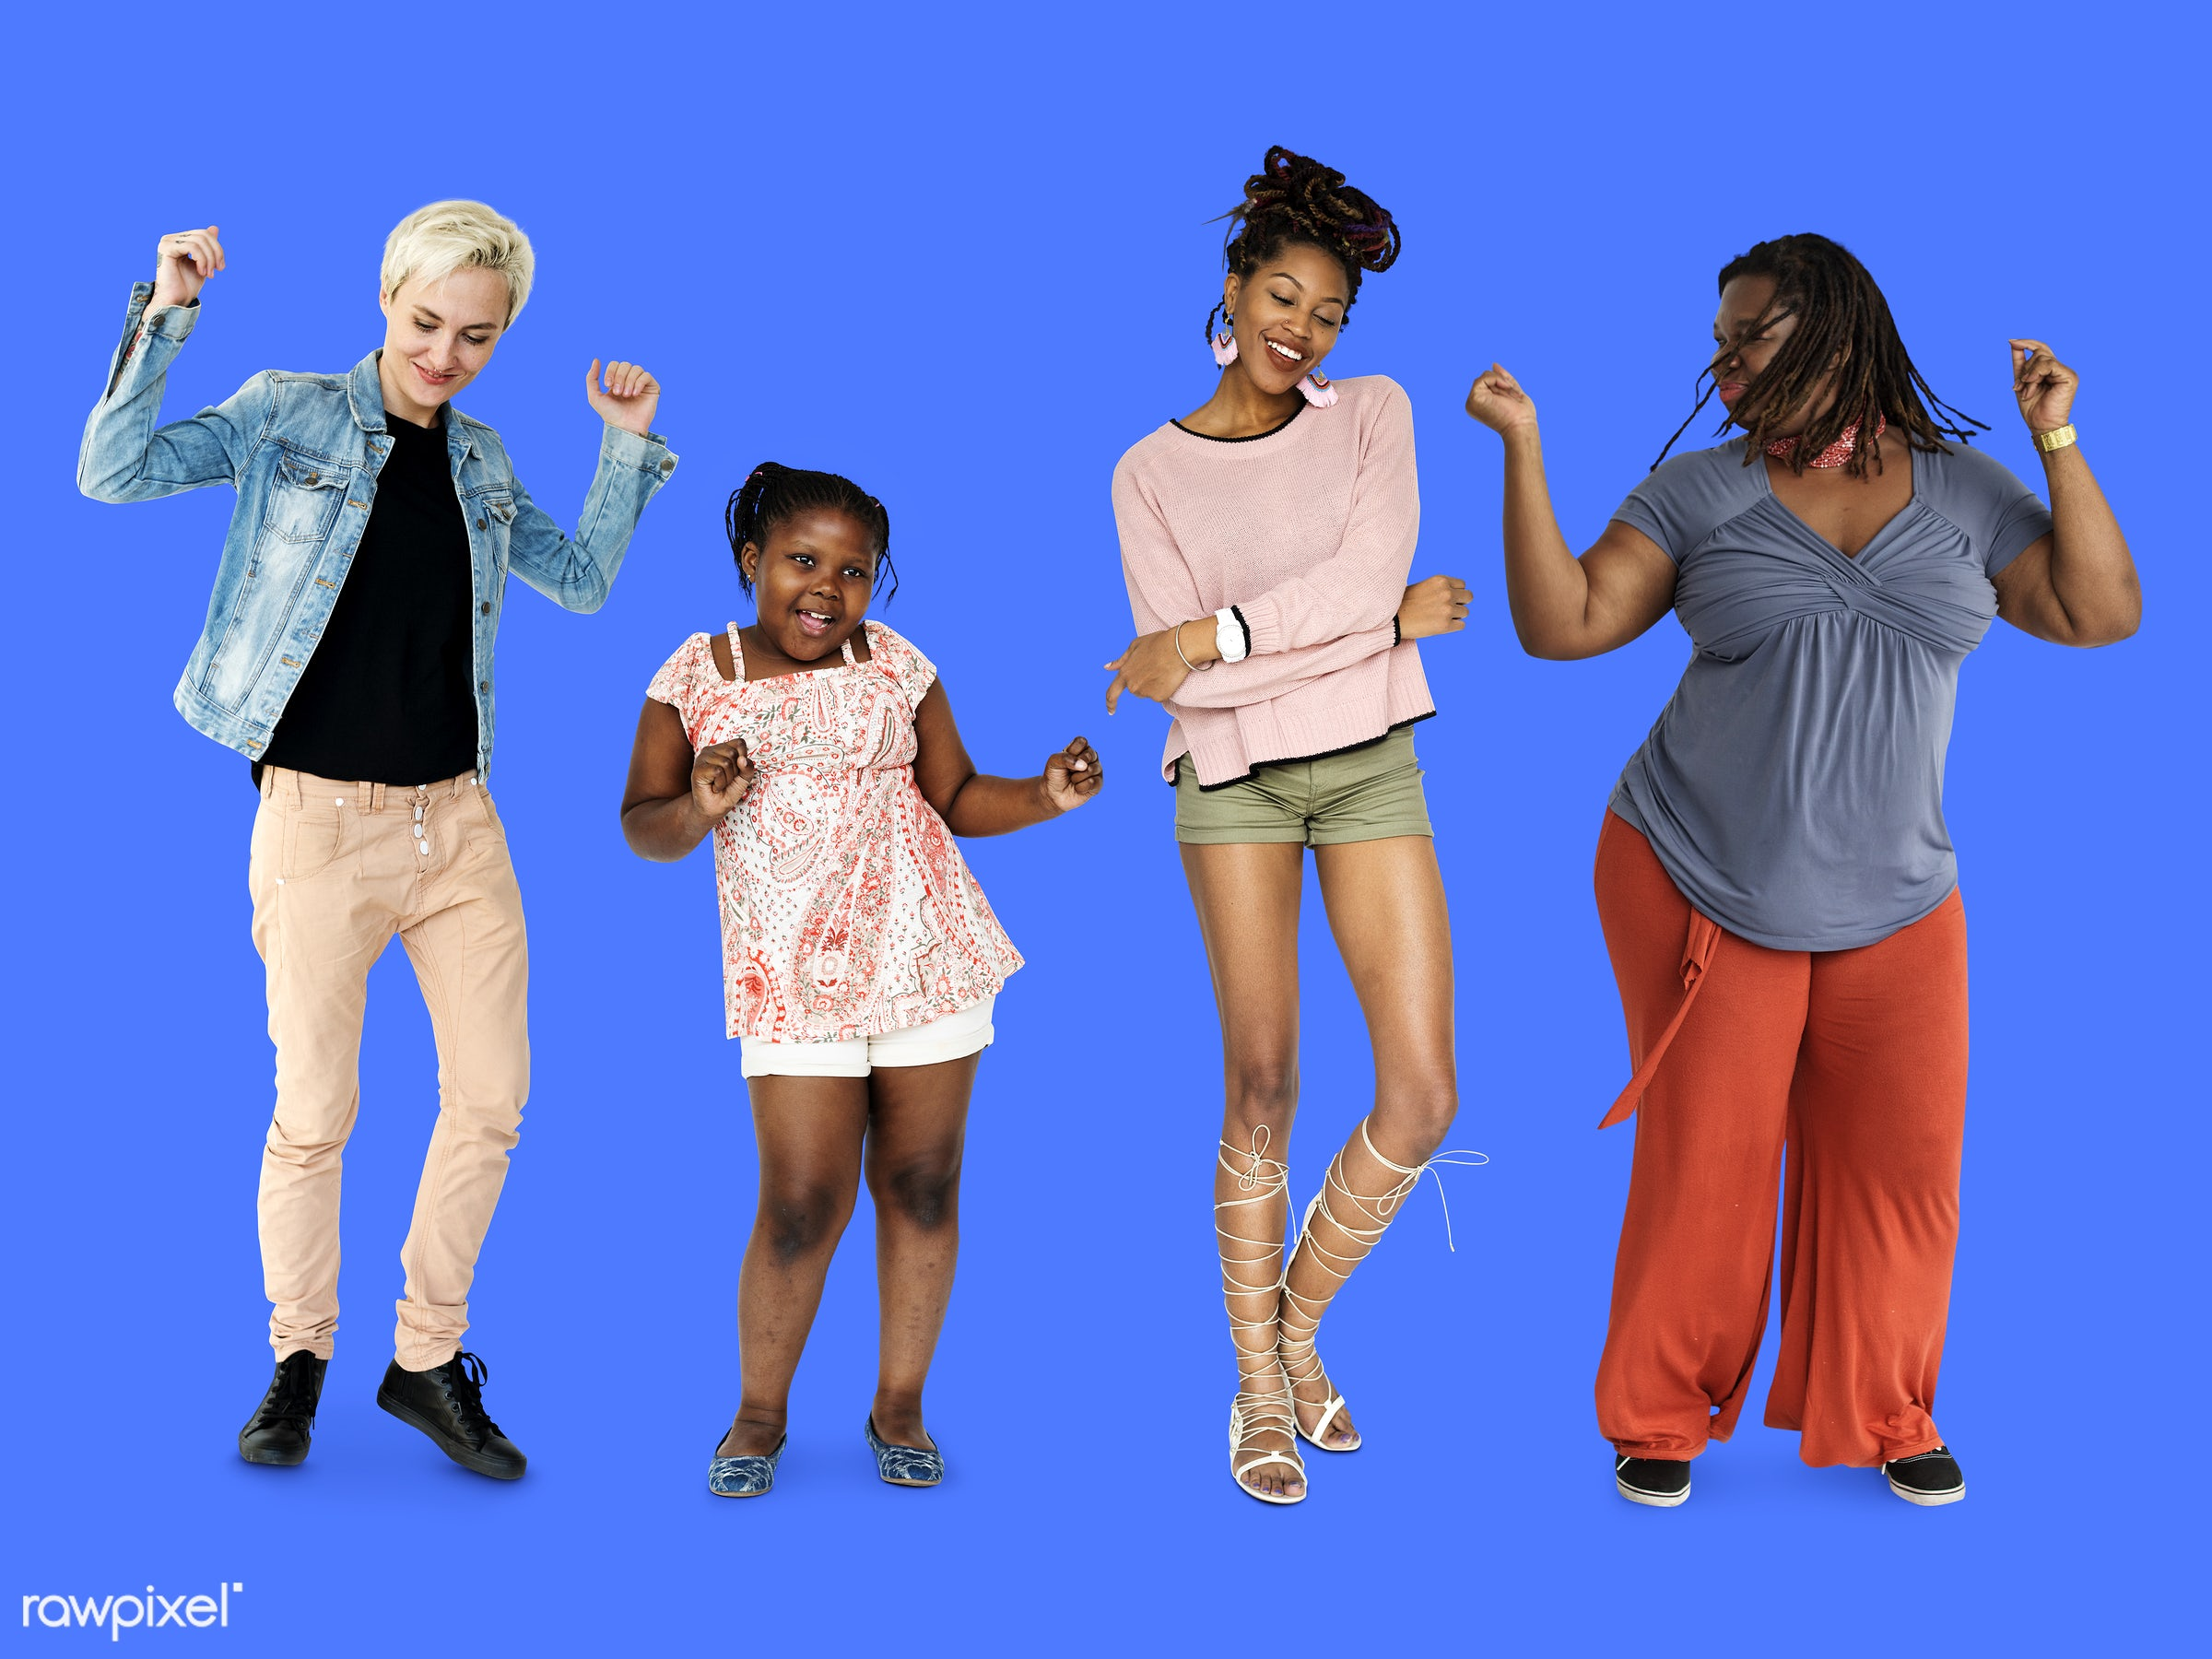 full length, diverse, relax, people, race, positivity, caucasian, asian, woman, lifestyle, movement, studio squareset,...